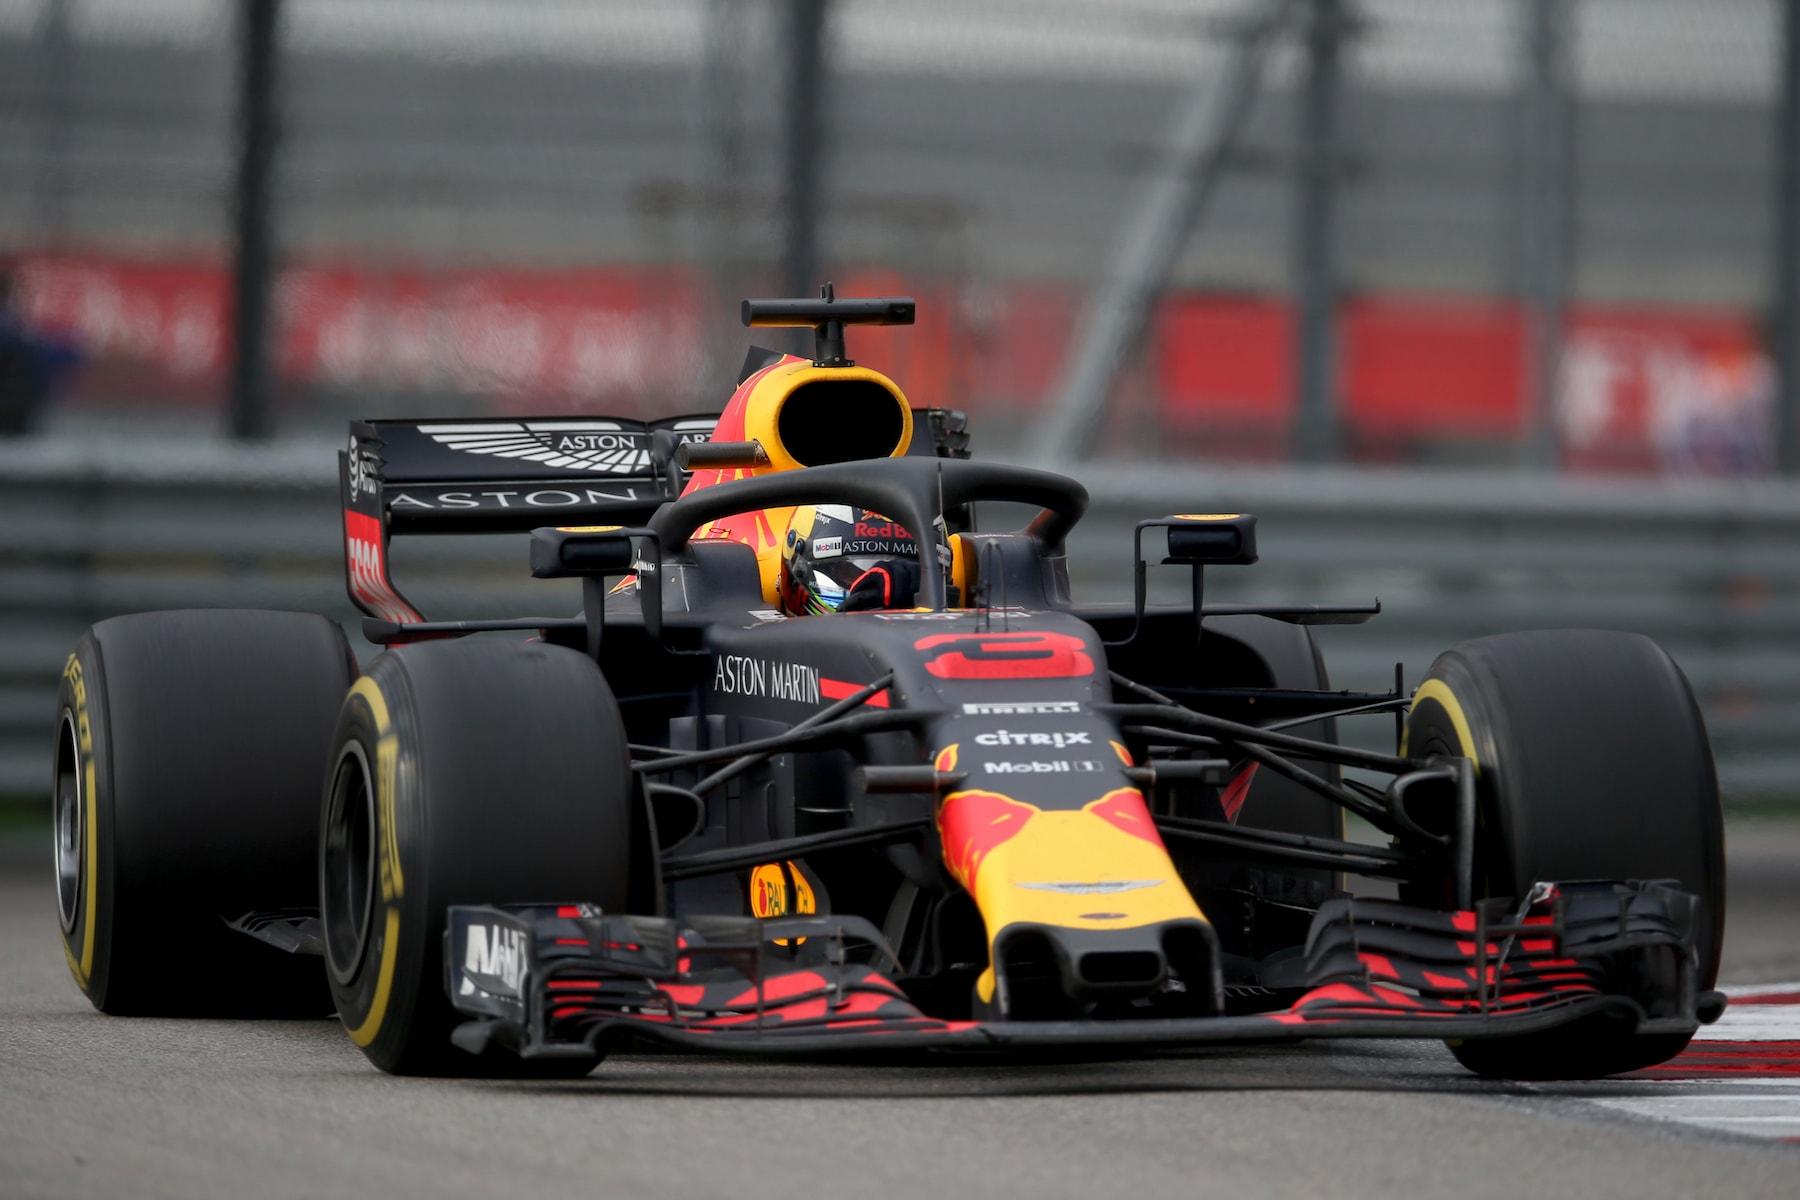 G 2018 Daniel Ricciardo | Red Bull RB14 | 2018 Russian GP 1 copy.jpg